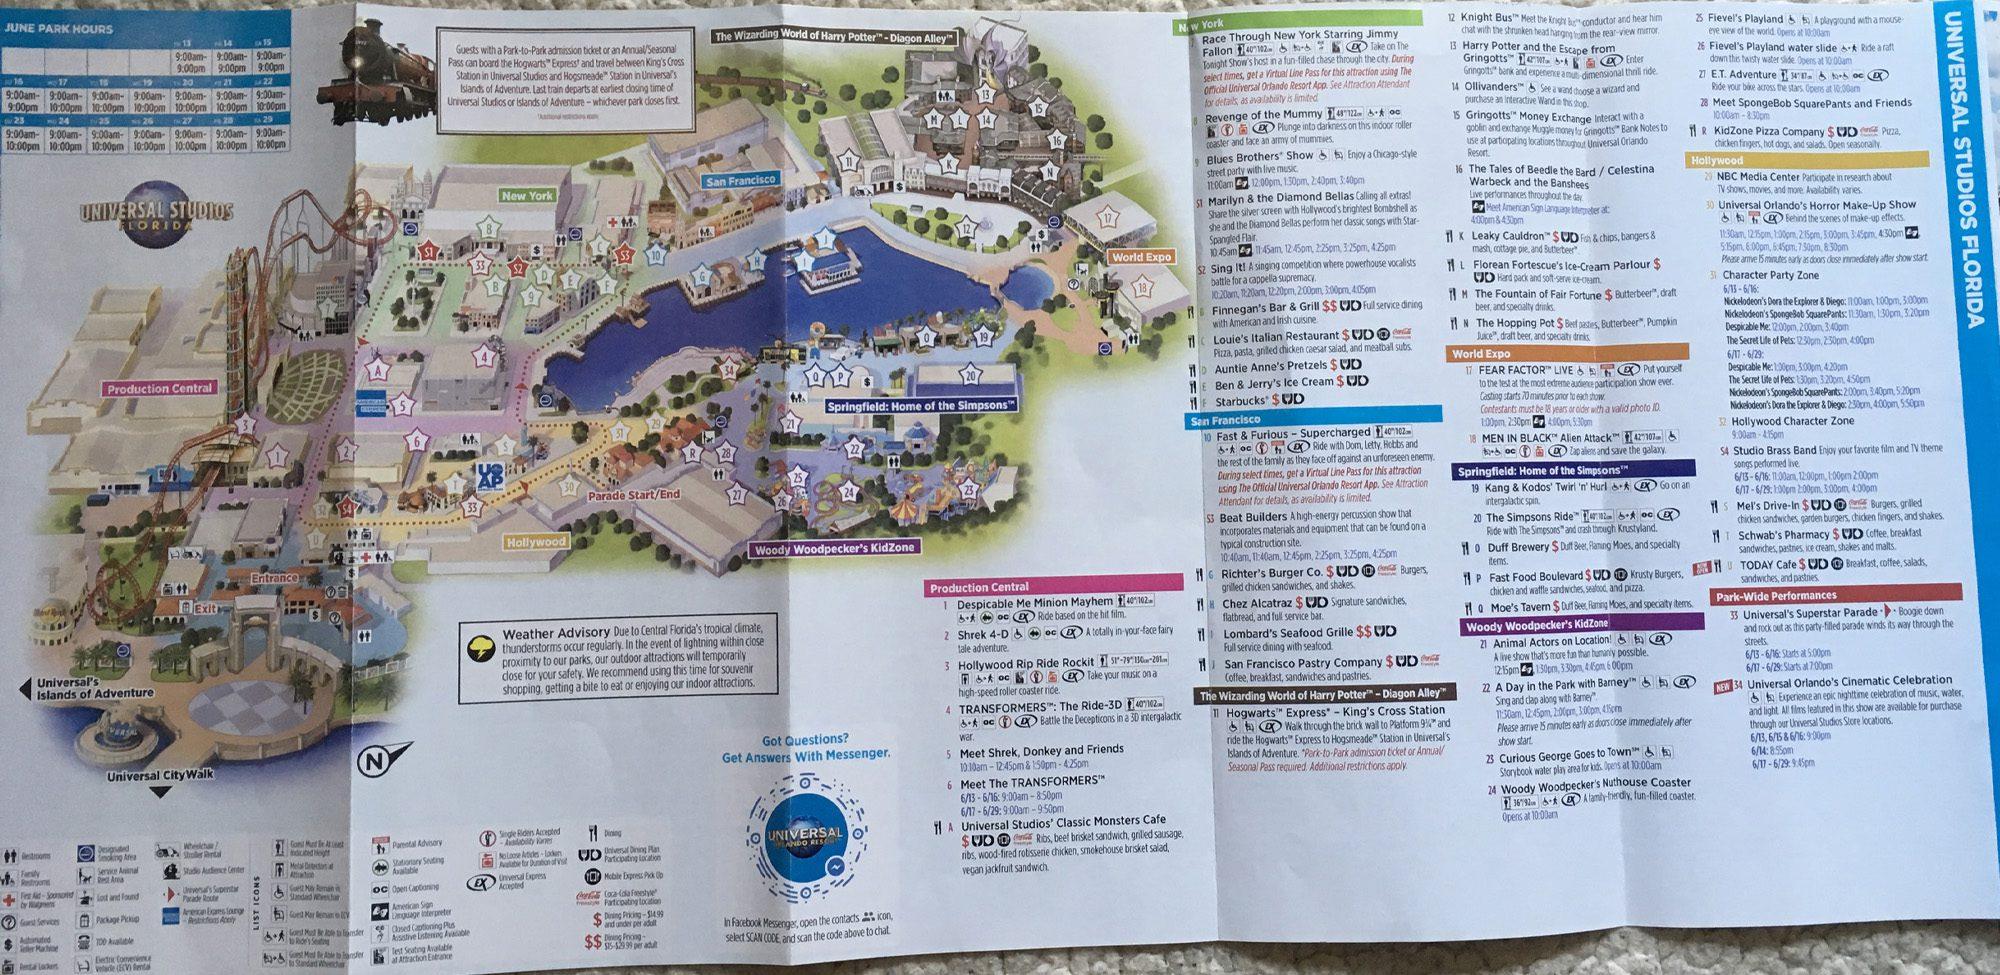 2019 Universal Orlando Map